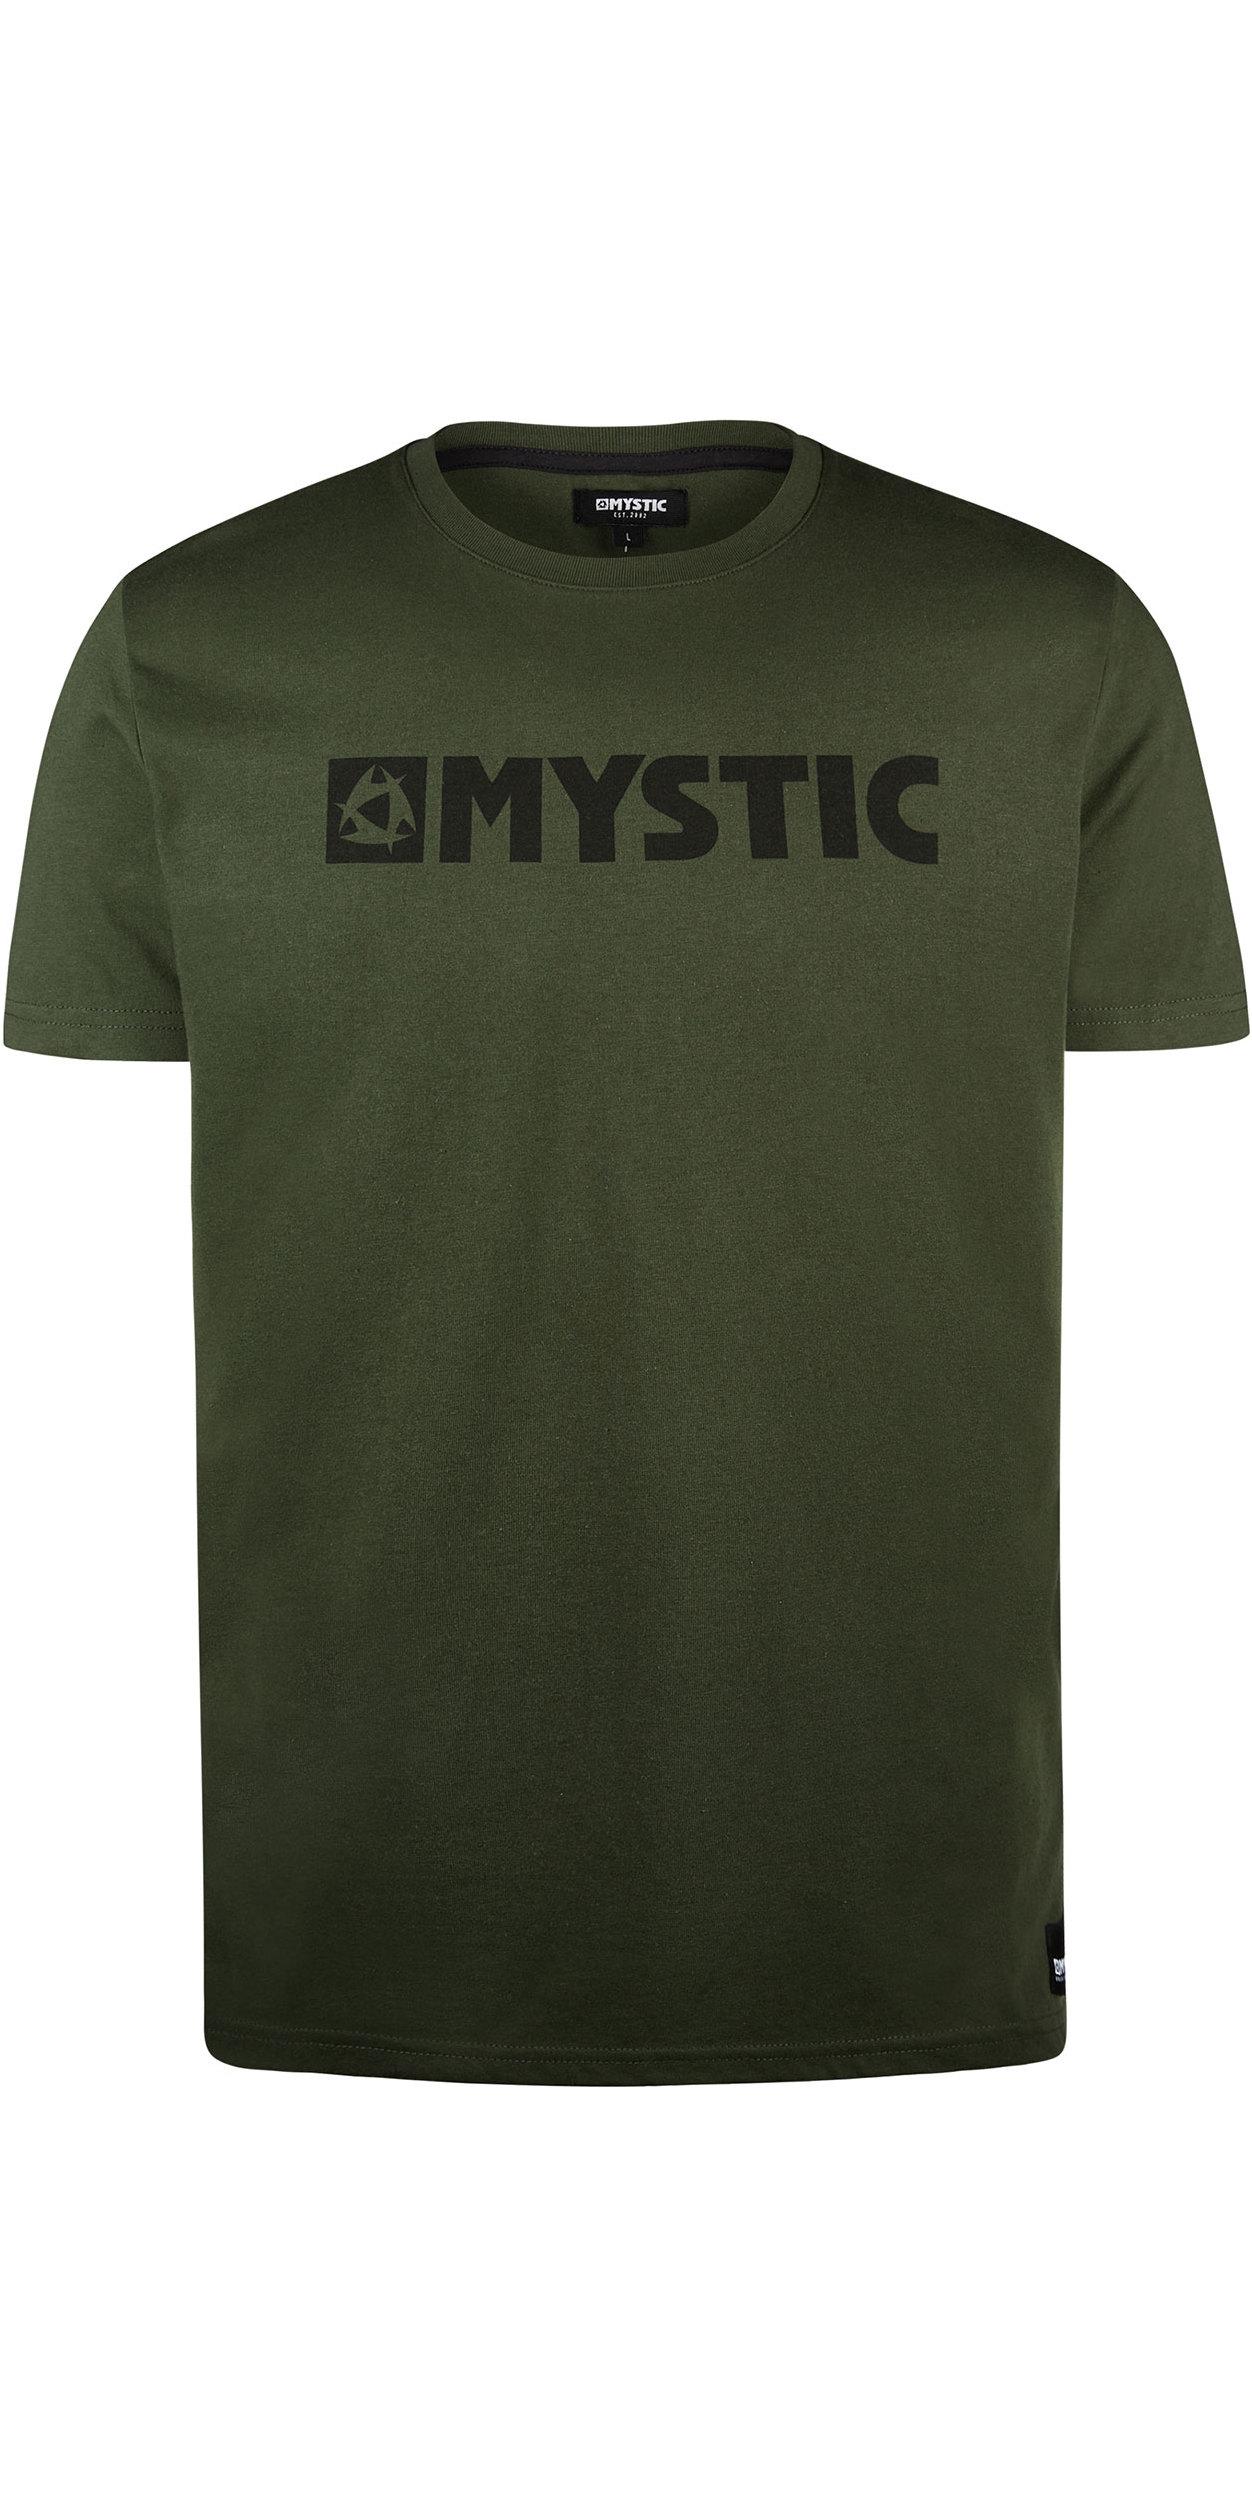 2019 Mystic Mens Brand Tee 190015 - Moss